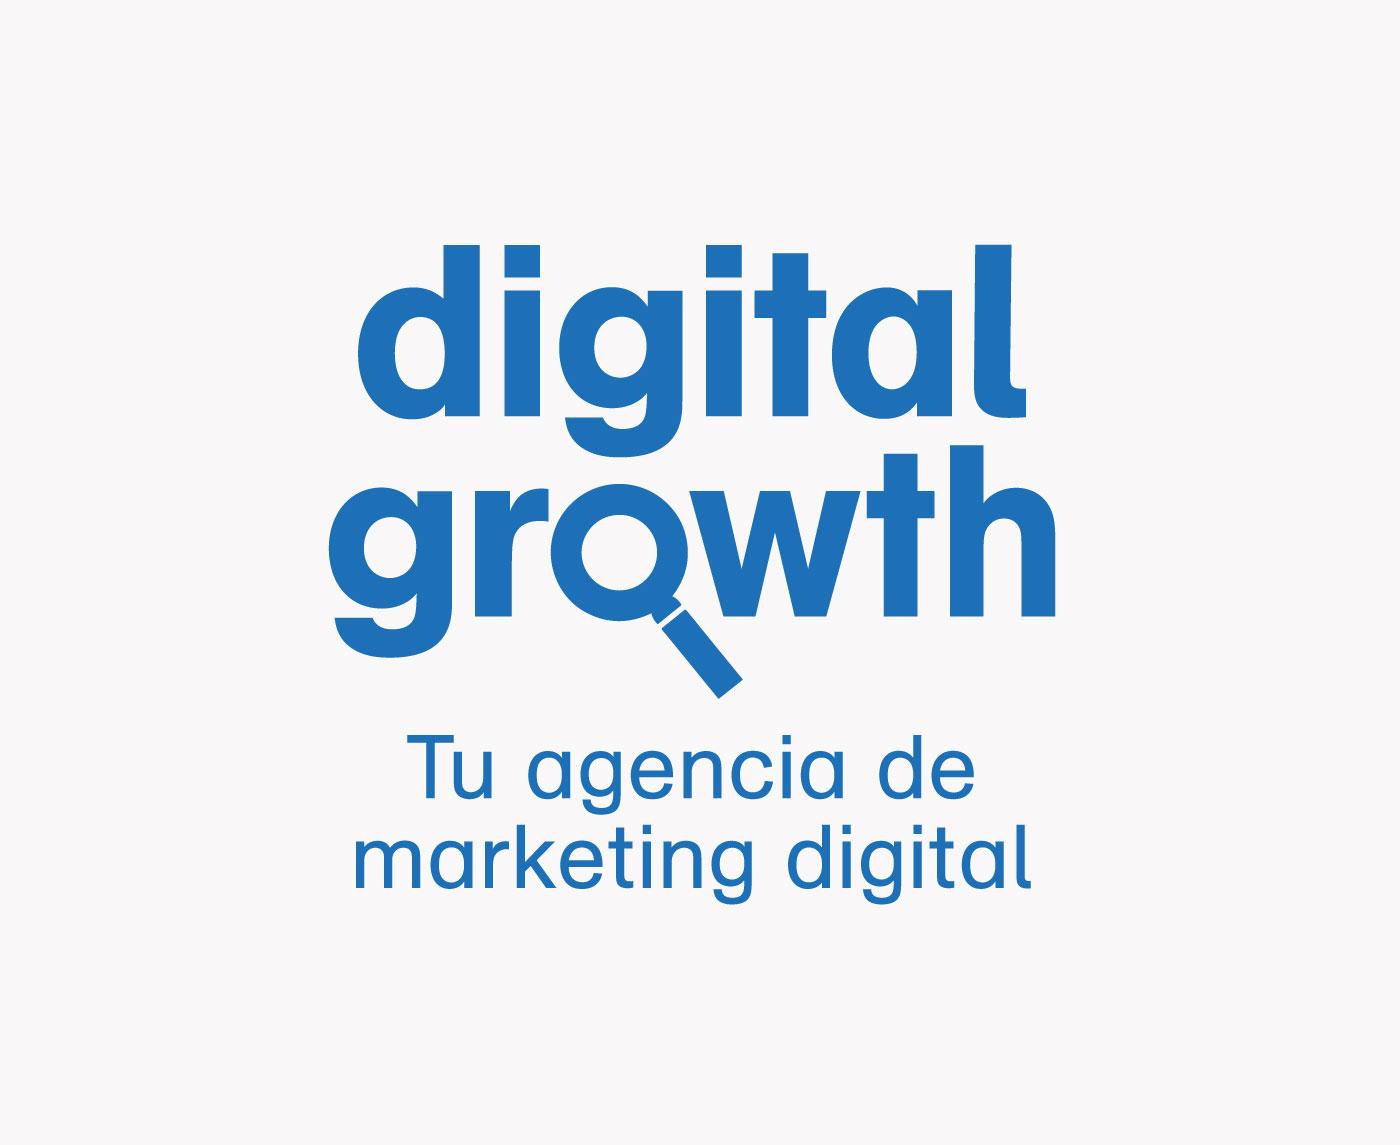 Branding logotipo agencia marketing digital